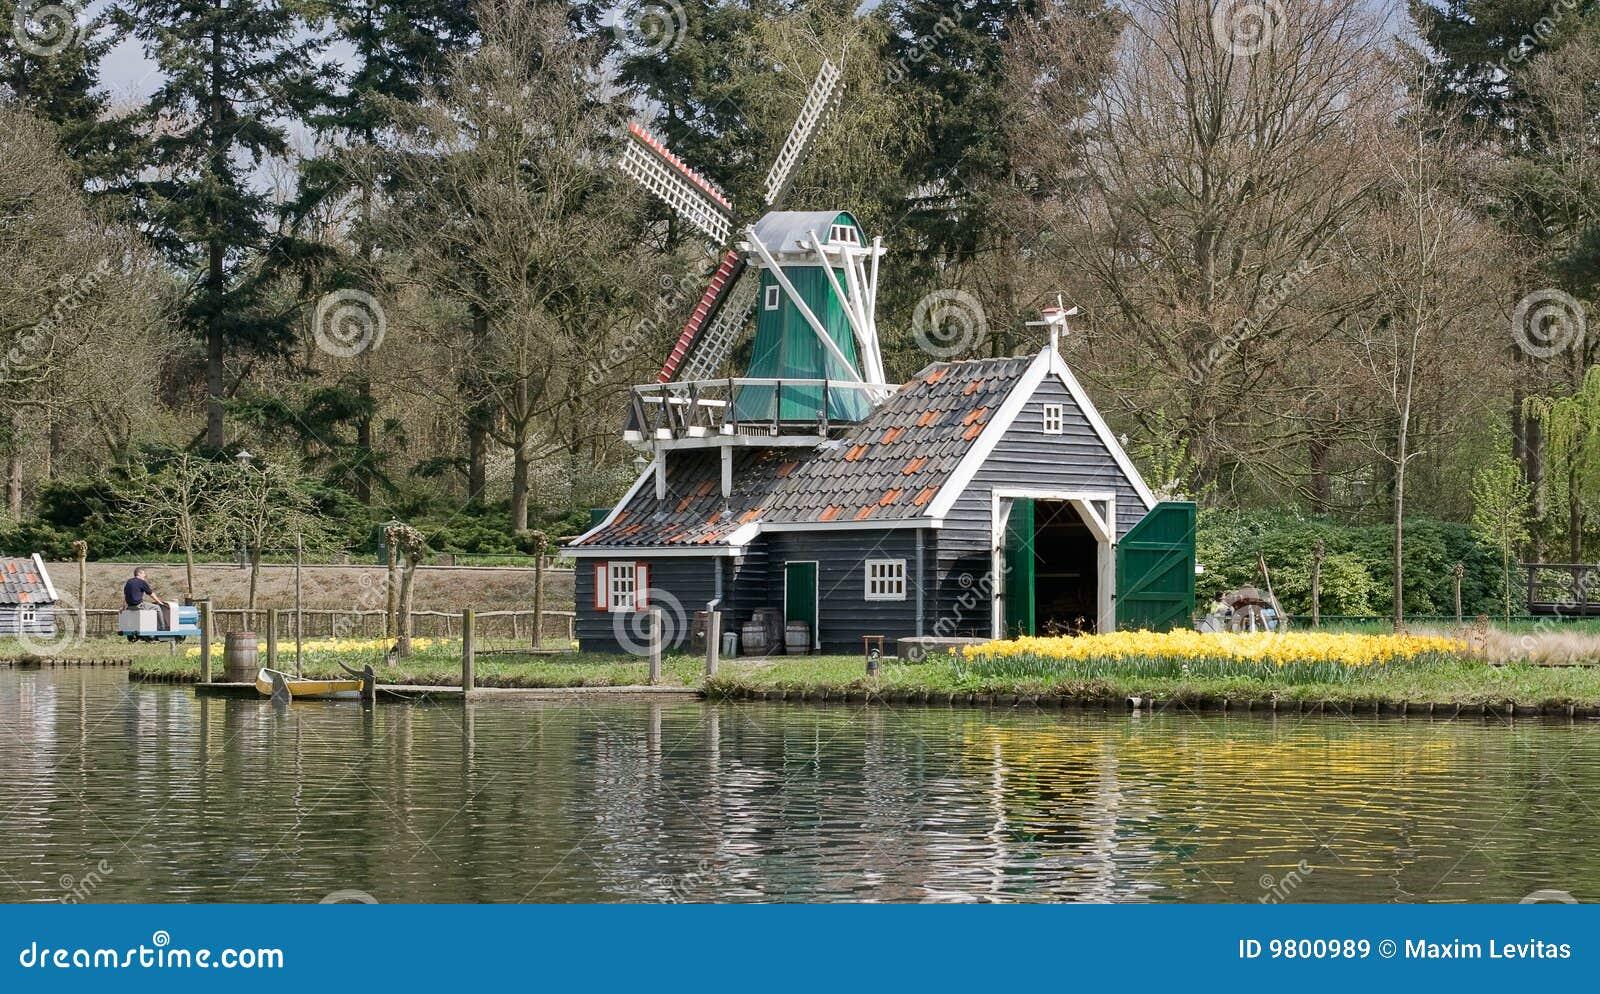 Efteling an amusement park in netherlands stock image for Amusement park netherlands